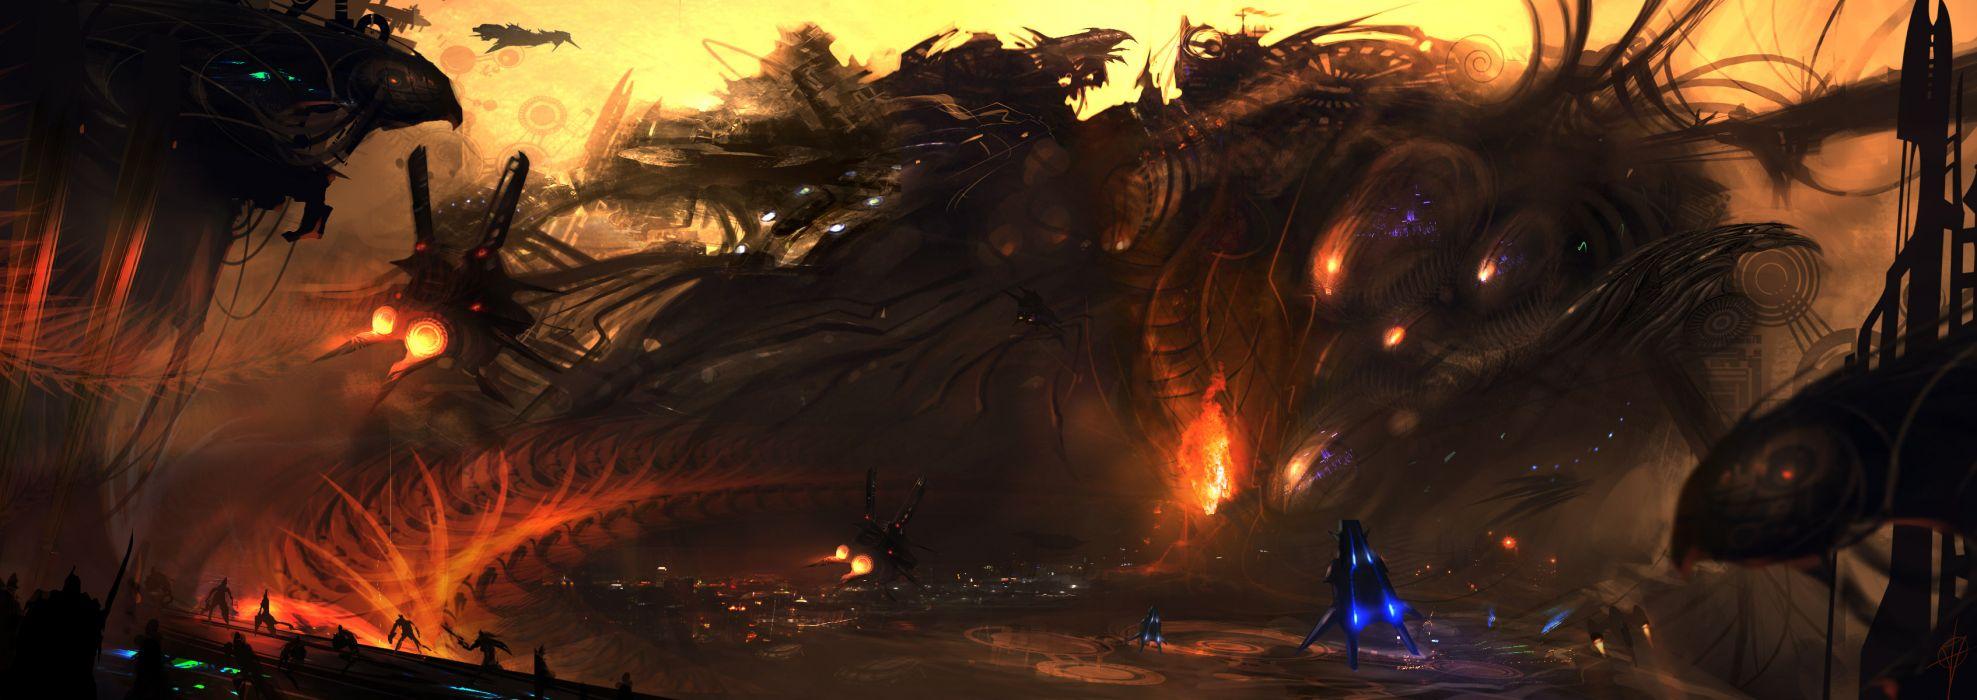 Multi Monitor Dual Screen sci fi art fantasy monster fire battle dark horror warrior wallpaper